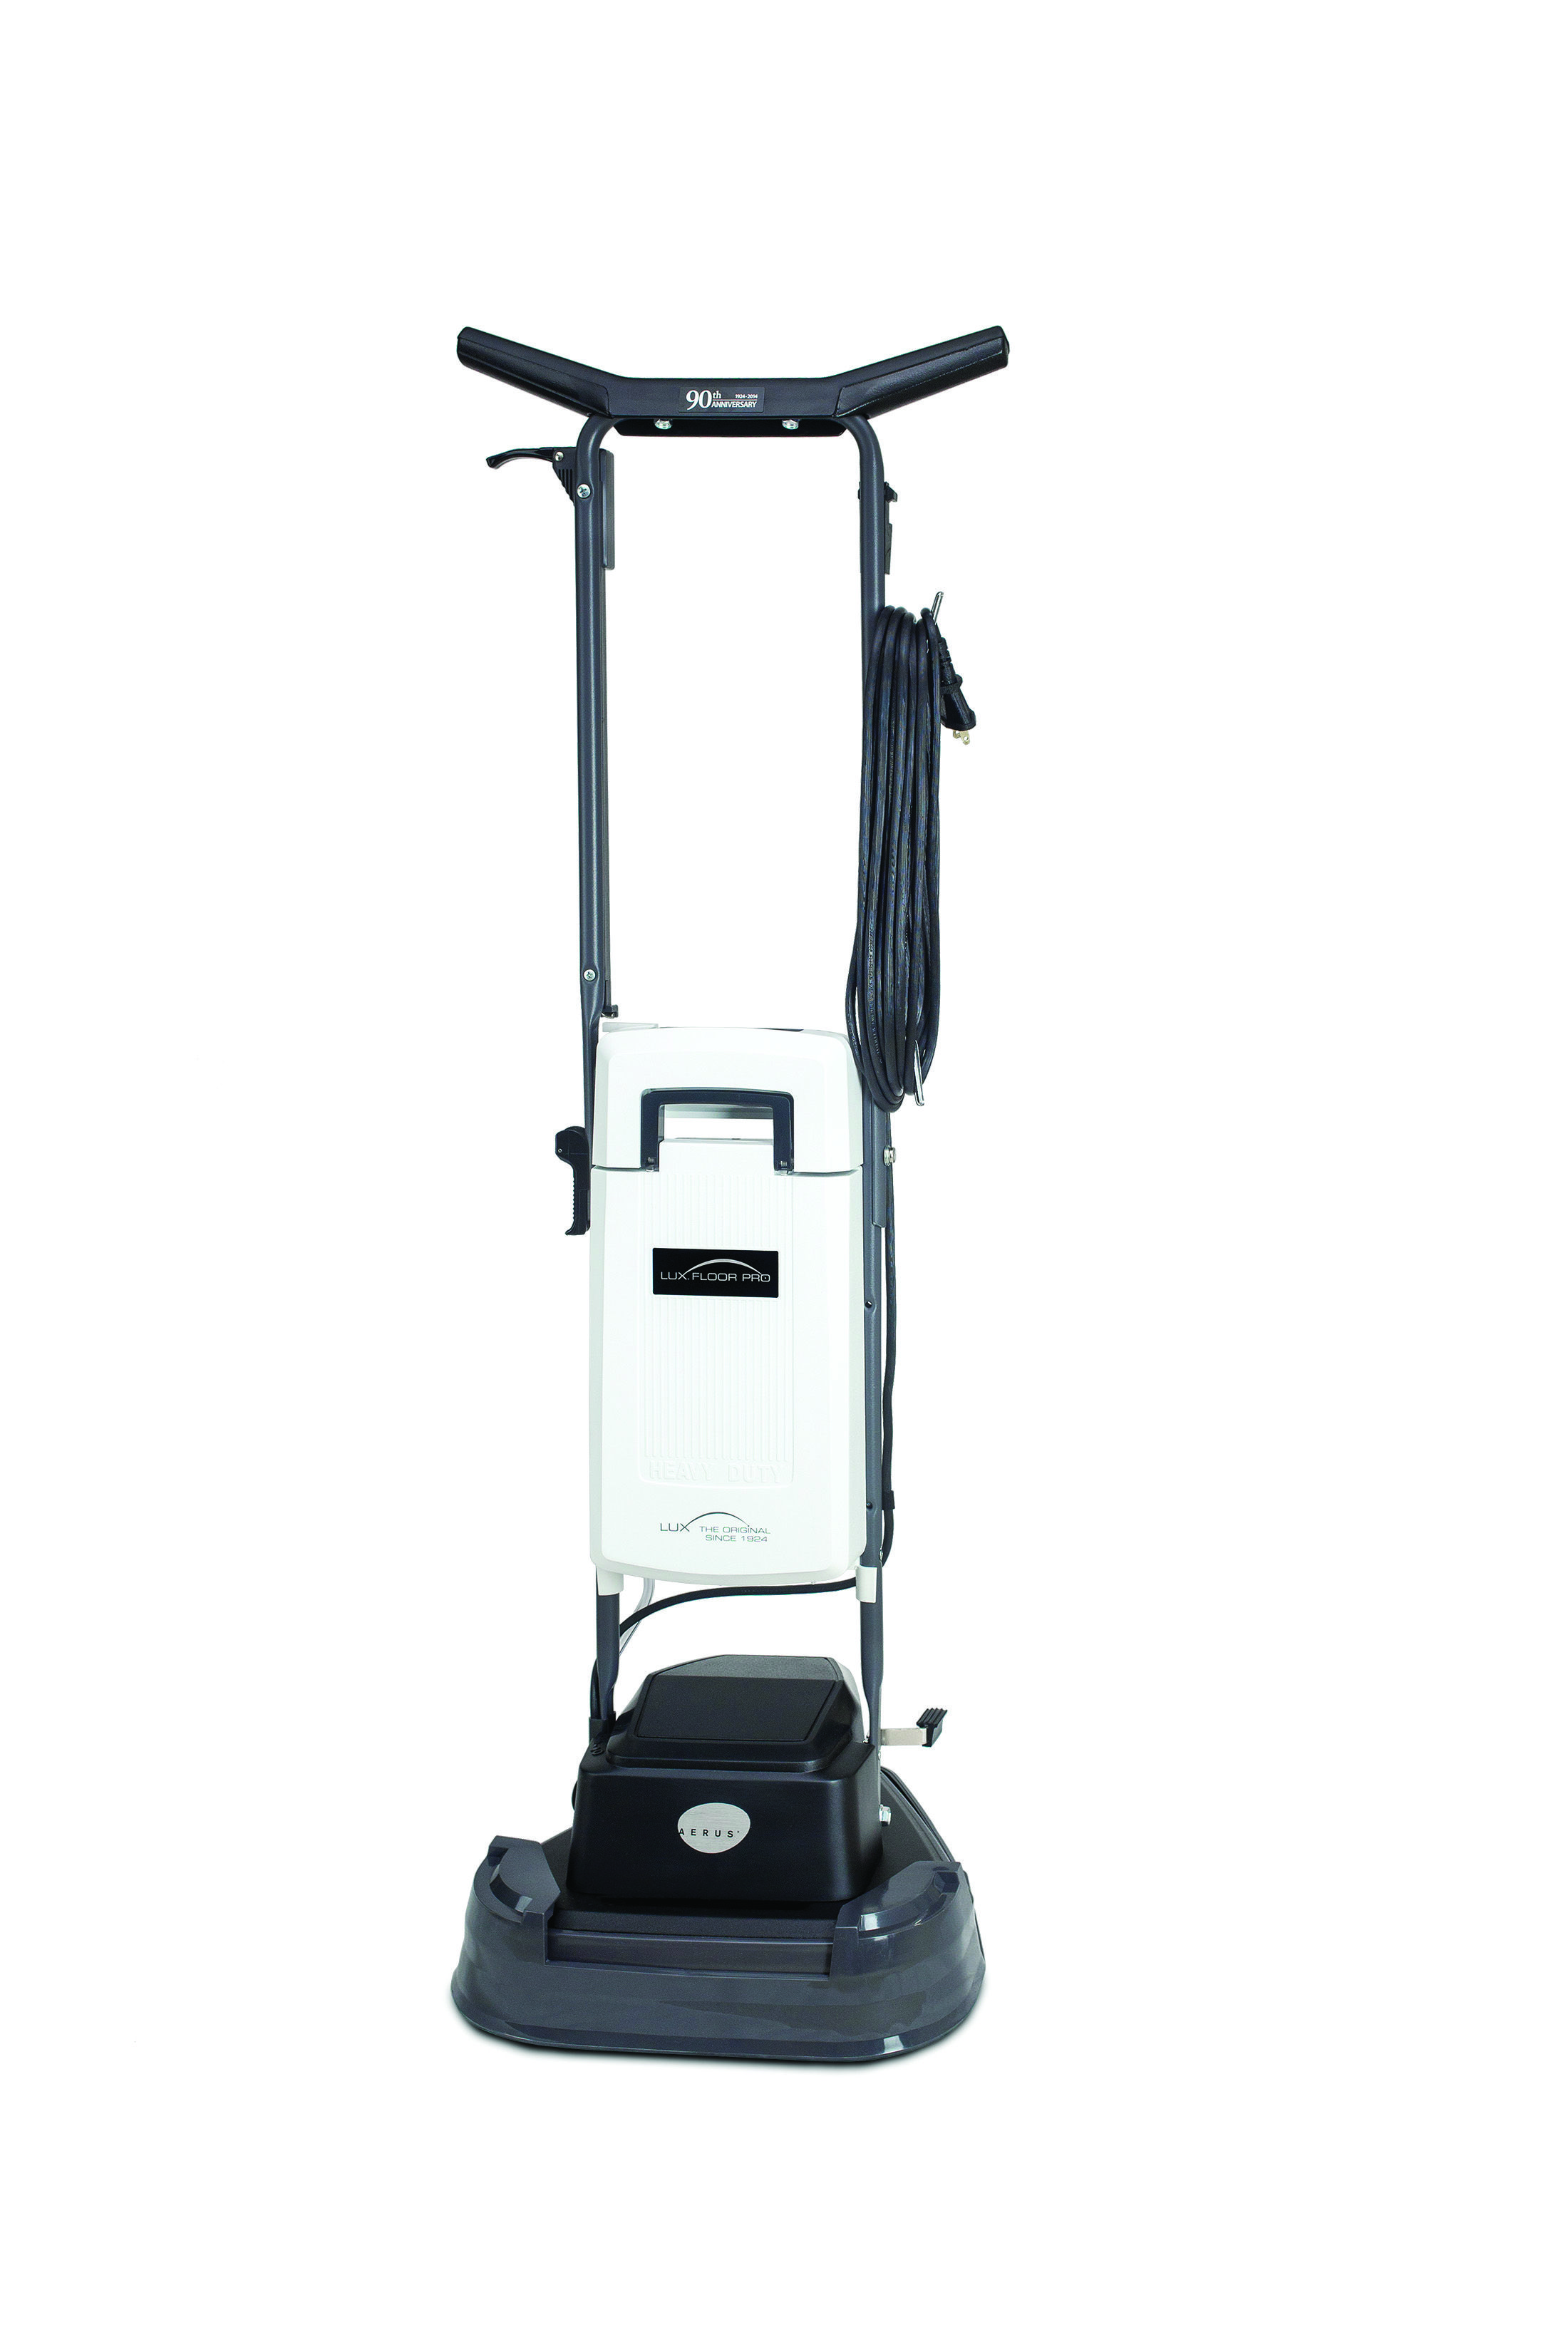 50 OFF NOW! Lux Floor Pro Shampooer! Innovation design